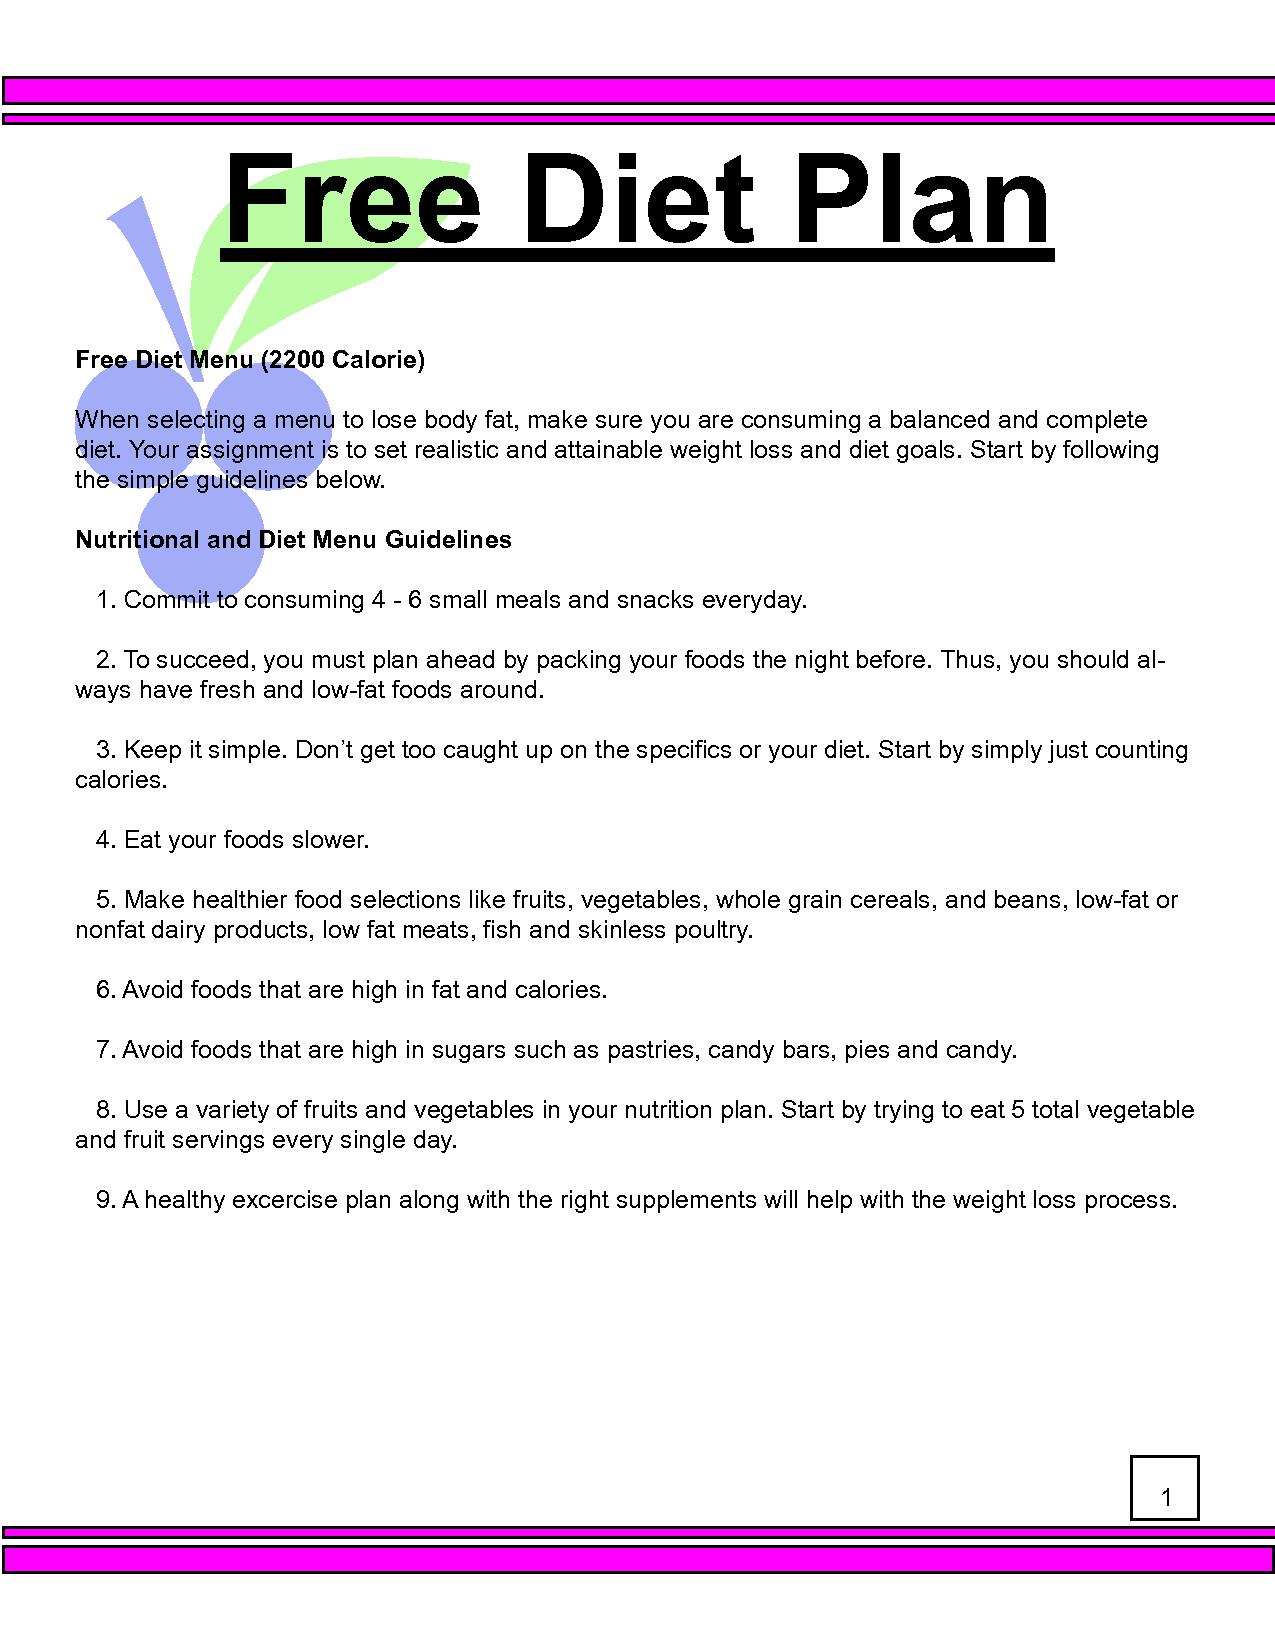 Diet nutrition plans free